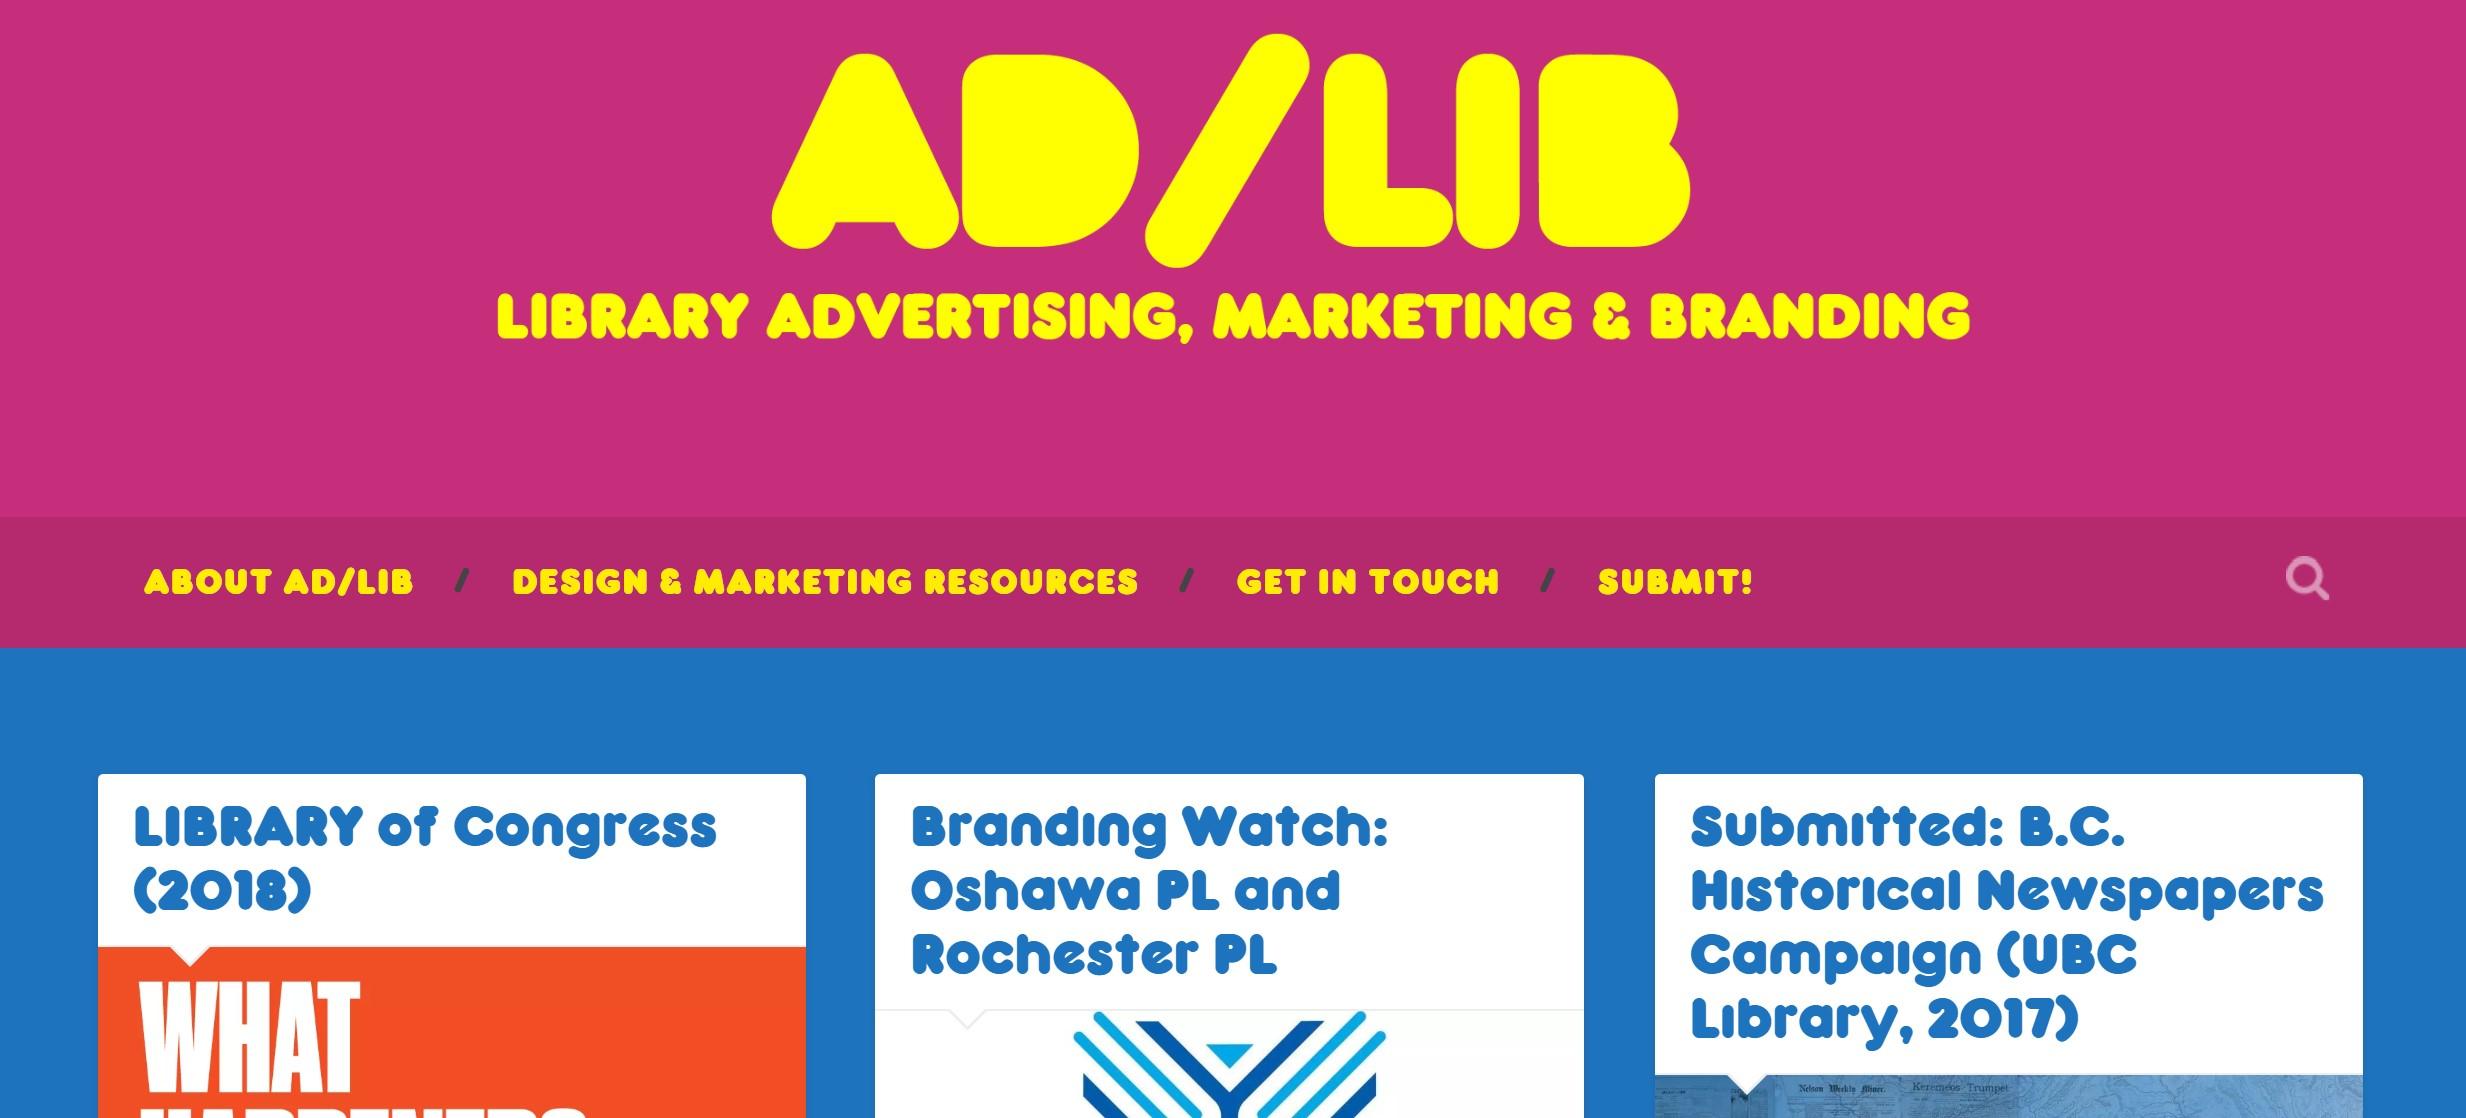 Ad/Lib Library Marketing